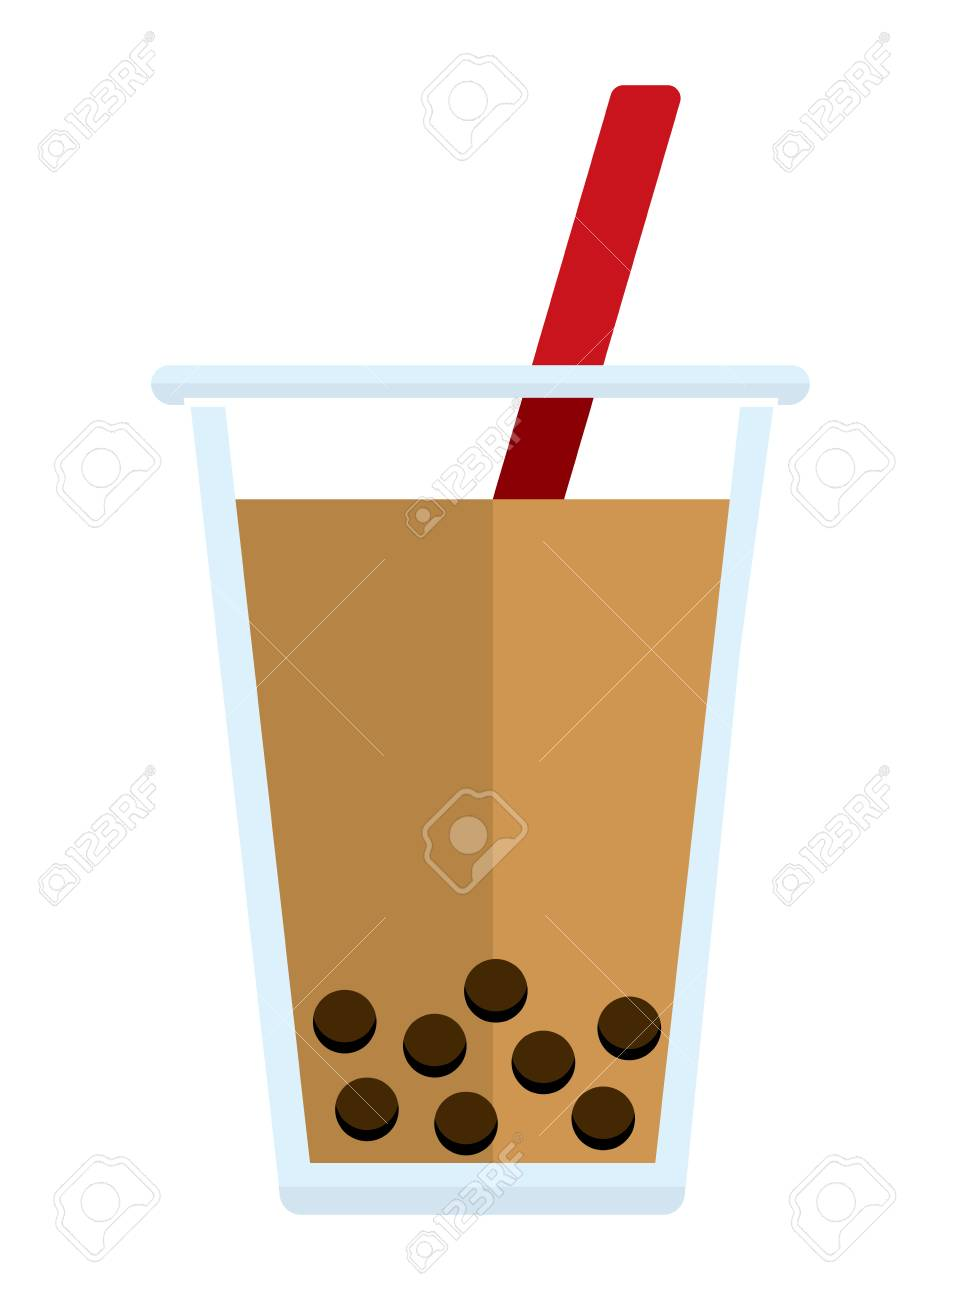 bubble tea tapioca milk tea vector illustration royalty free cliparts vectors and stock illustration image 125320906 bubble tea tapioca milk tea vector illustration